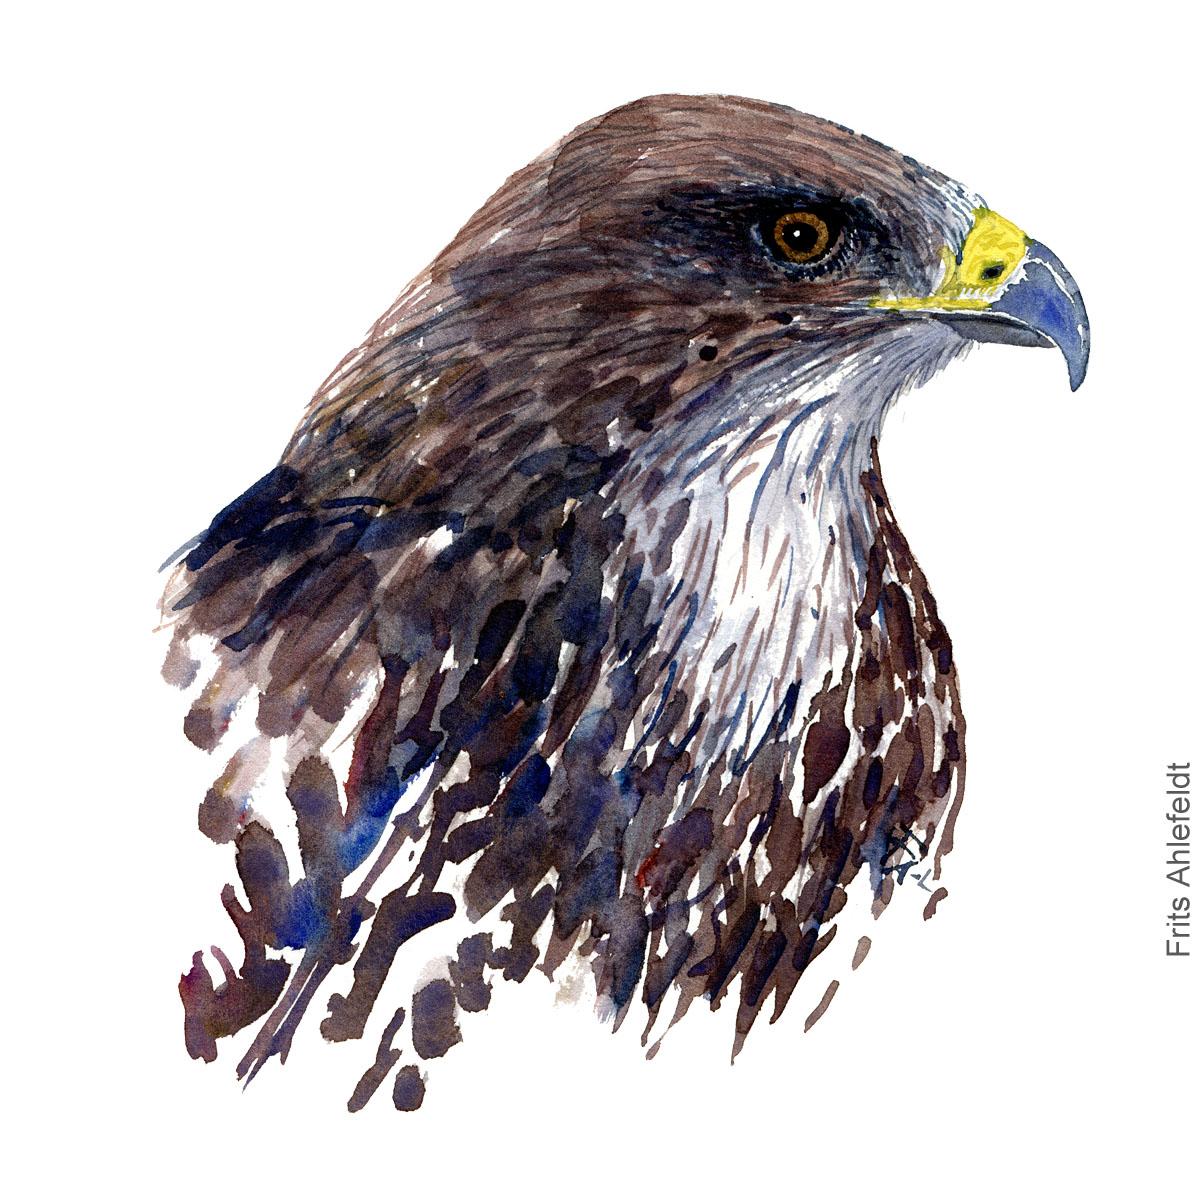 Musvaage - Buzzard head - Bird painting in watercolor by Frits Ahlefeldt - Fugle akvarel